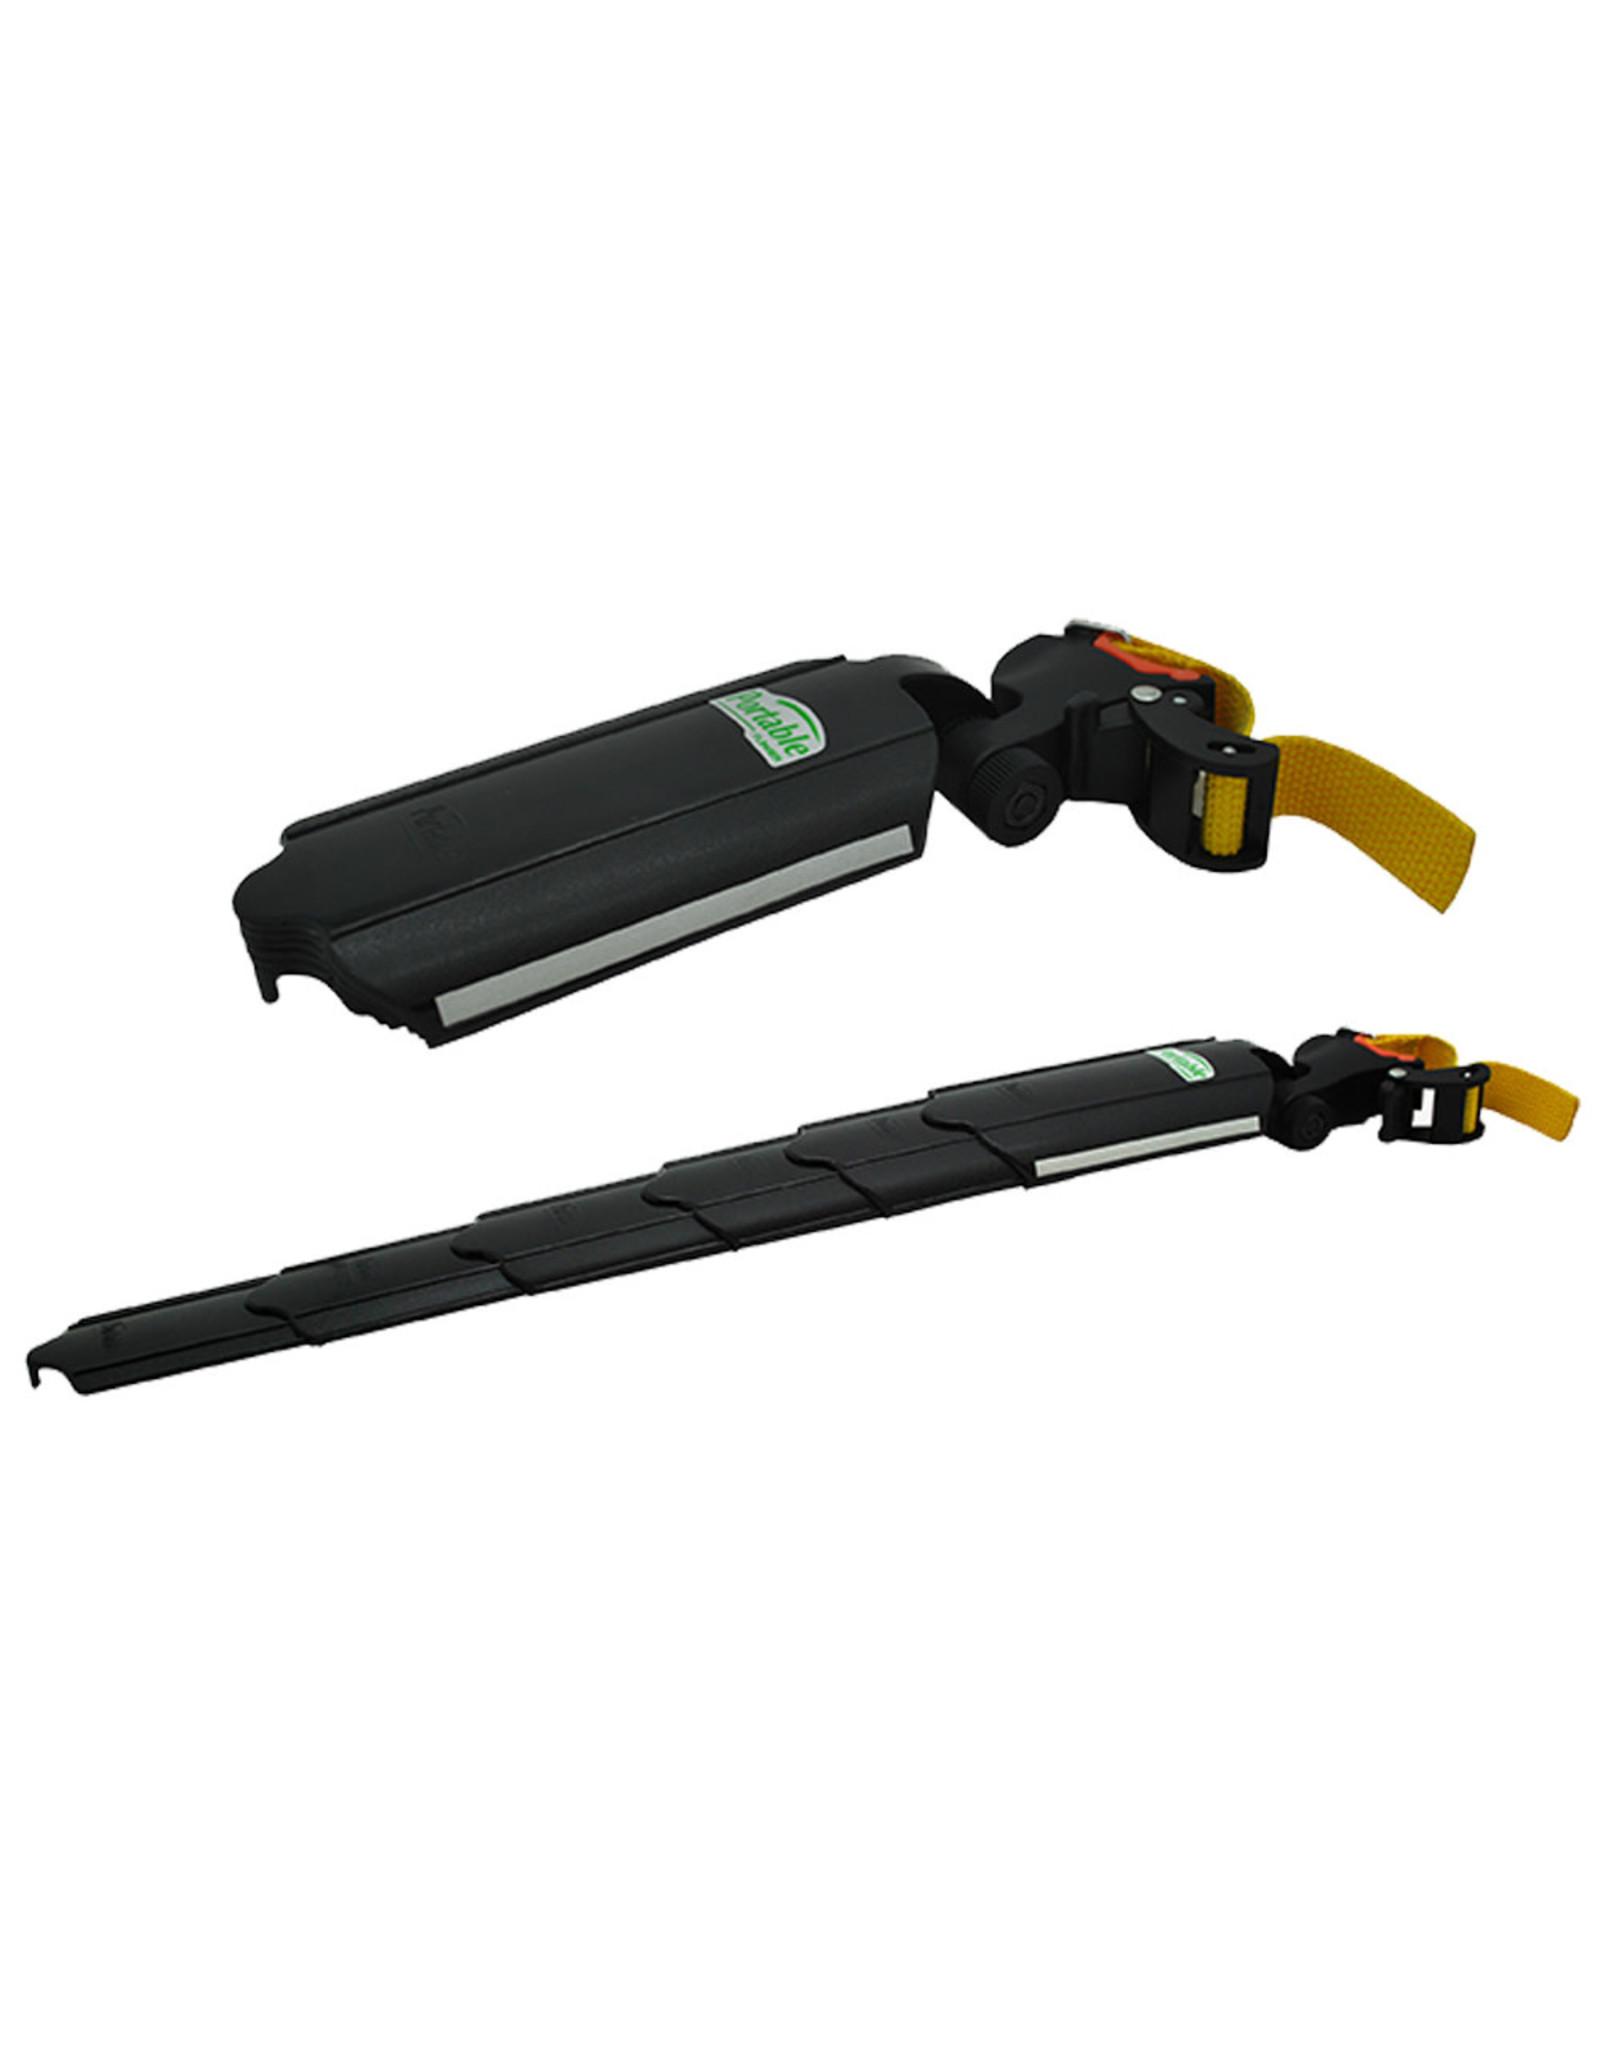 Flinger Mudguard Portable Folding